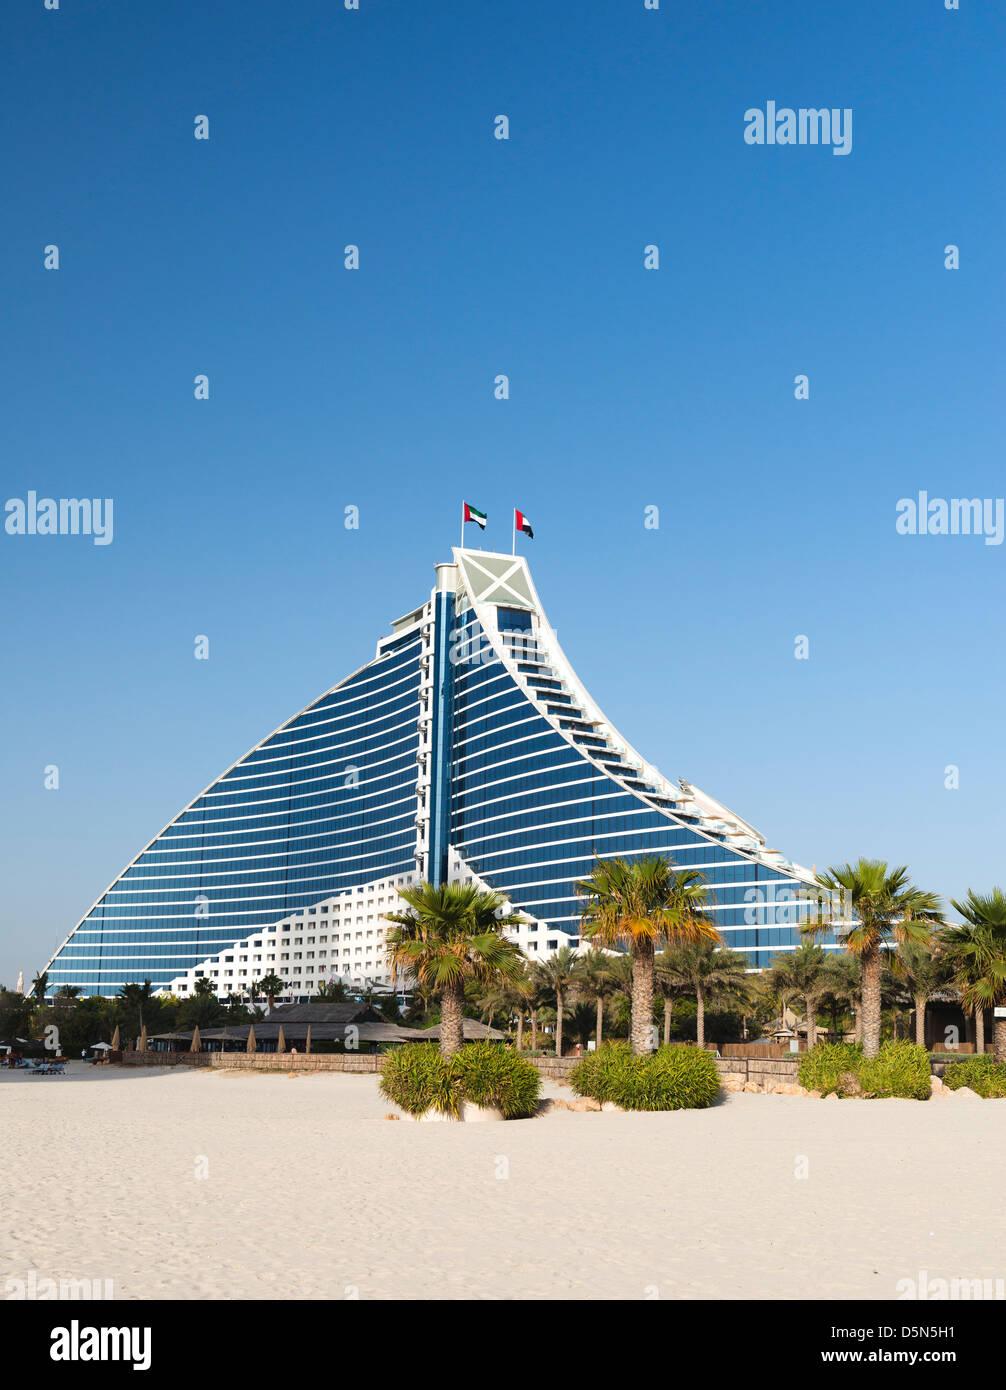 Luxury Jumeirah Beach hotel in Dubai United Arab Emirates - Stock Image